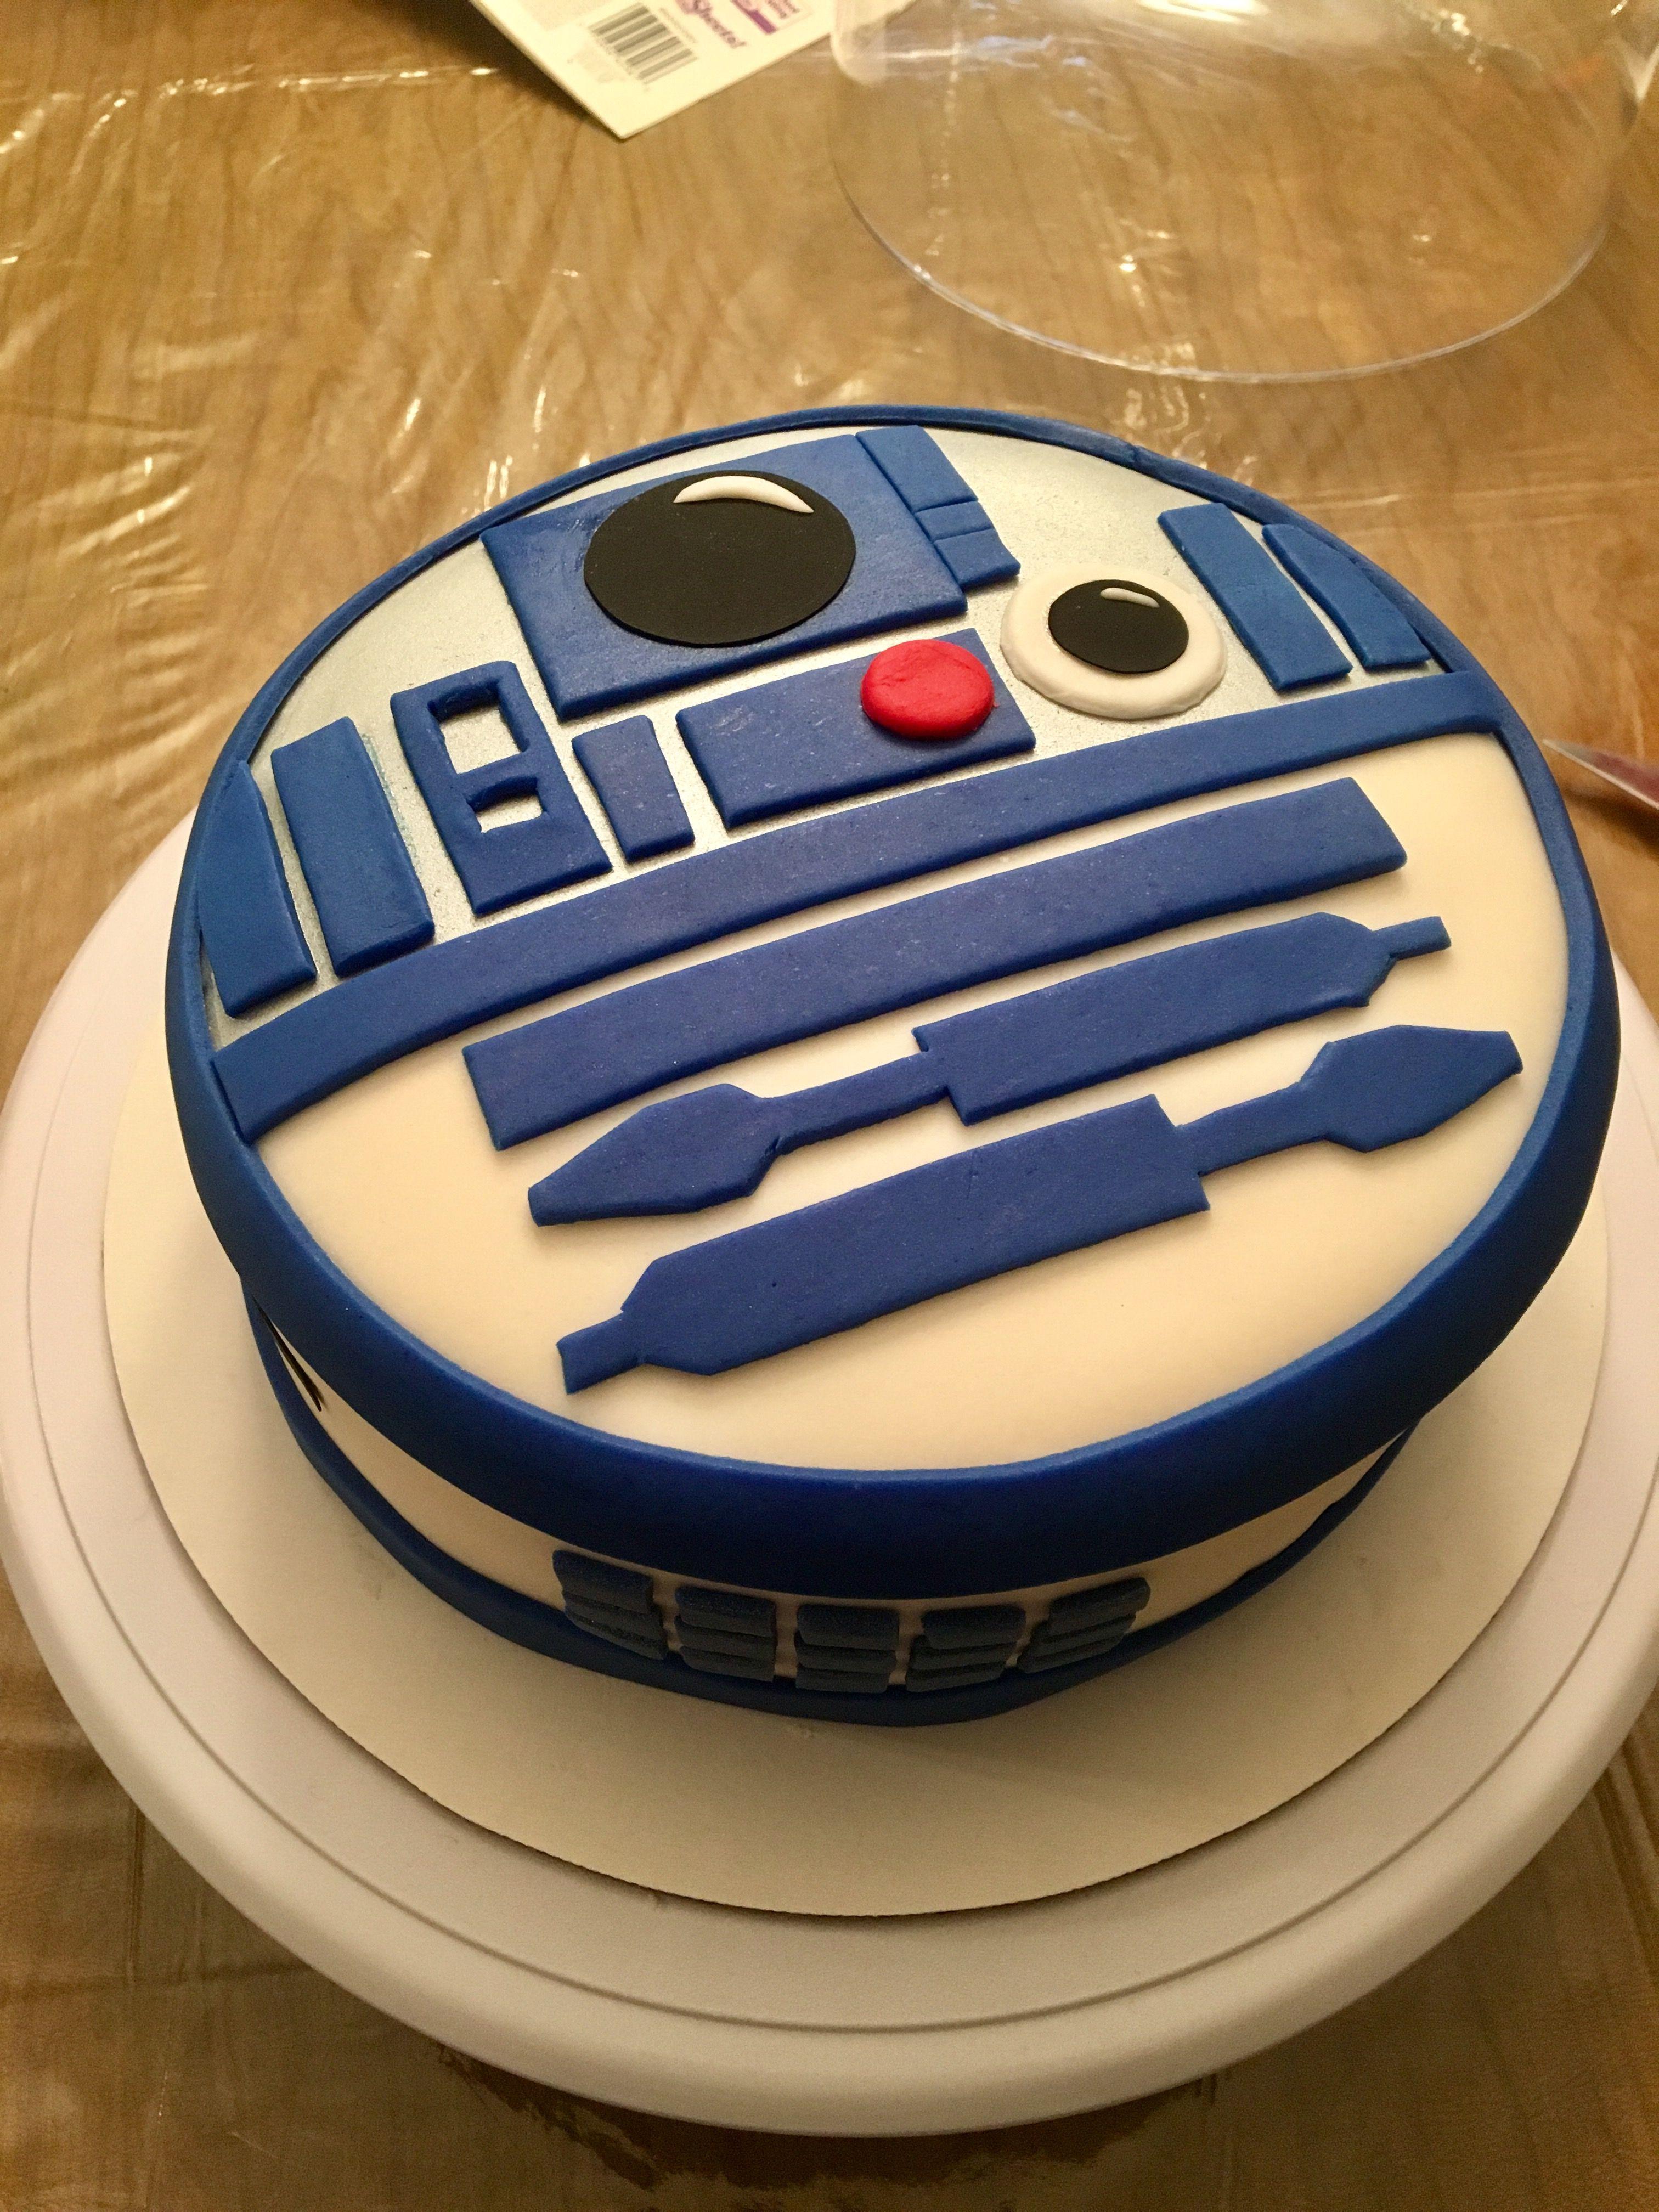 R2d2 Fondant Cake Star Wars Cake Cake War Cake